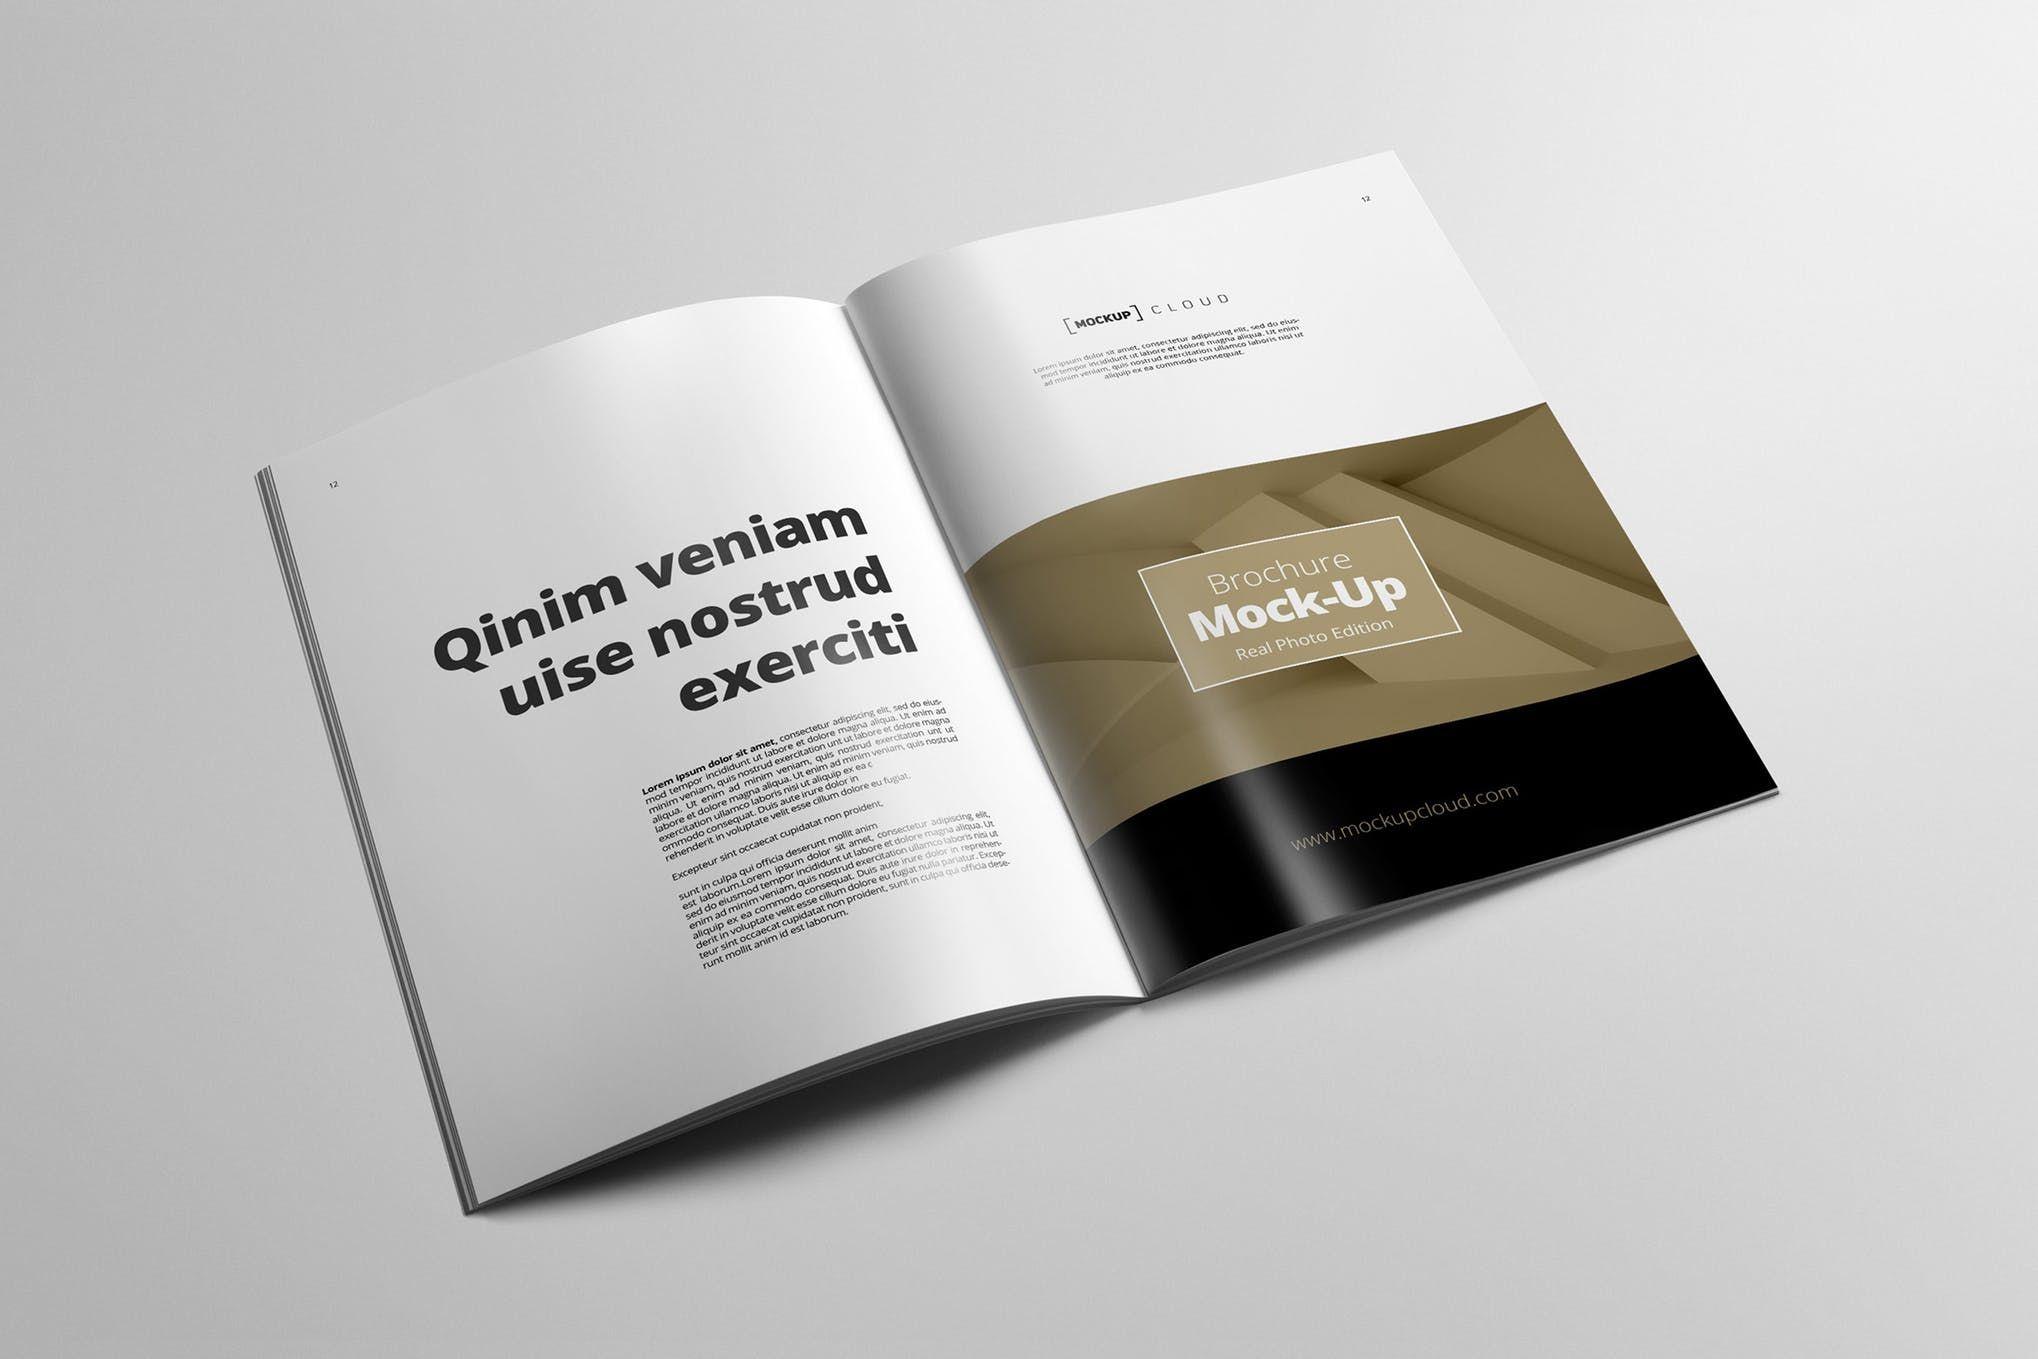 Portrait Brochure Mockup pany Brochure Design Corporate Brochure Design Brochure Mockup Tri Fold